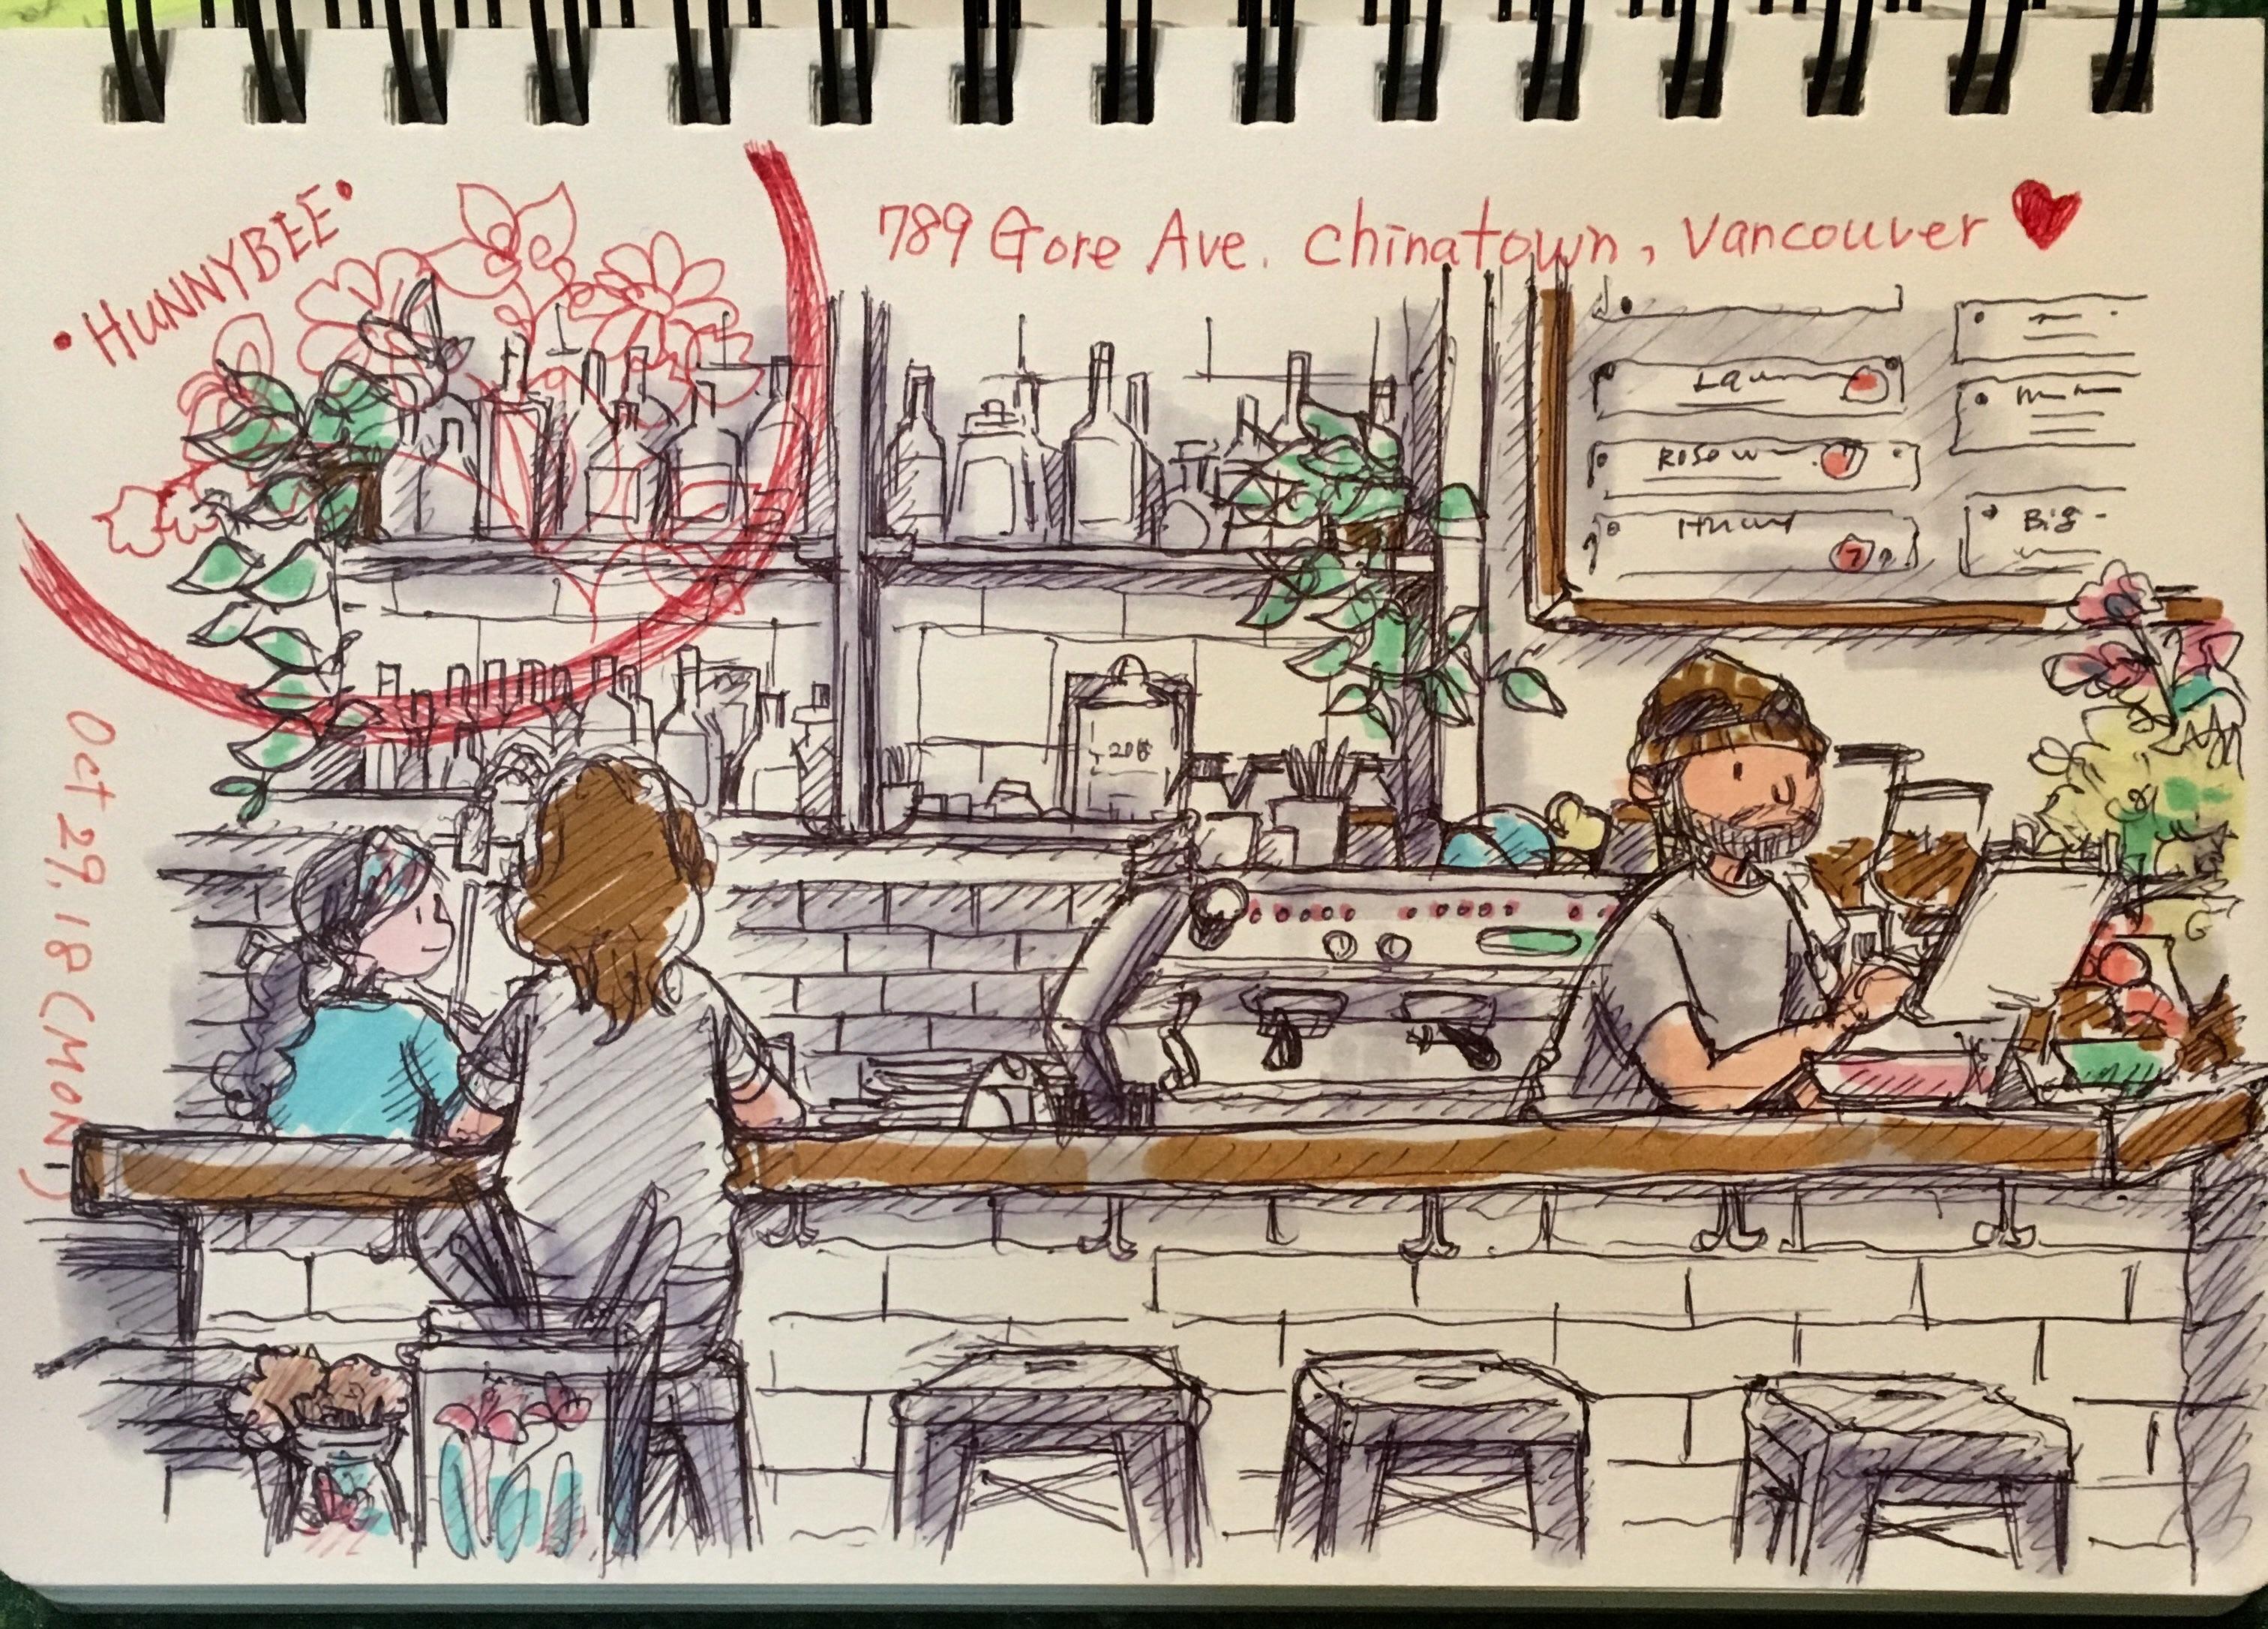 Hunnybee Cafe